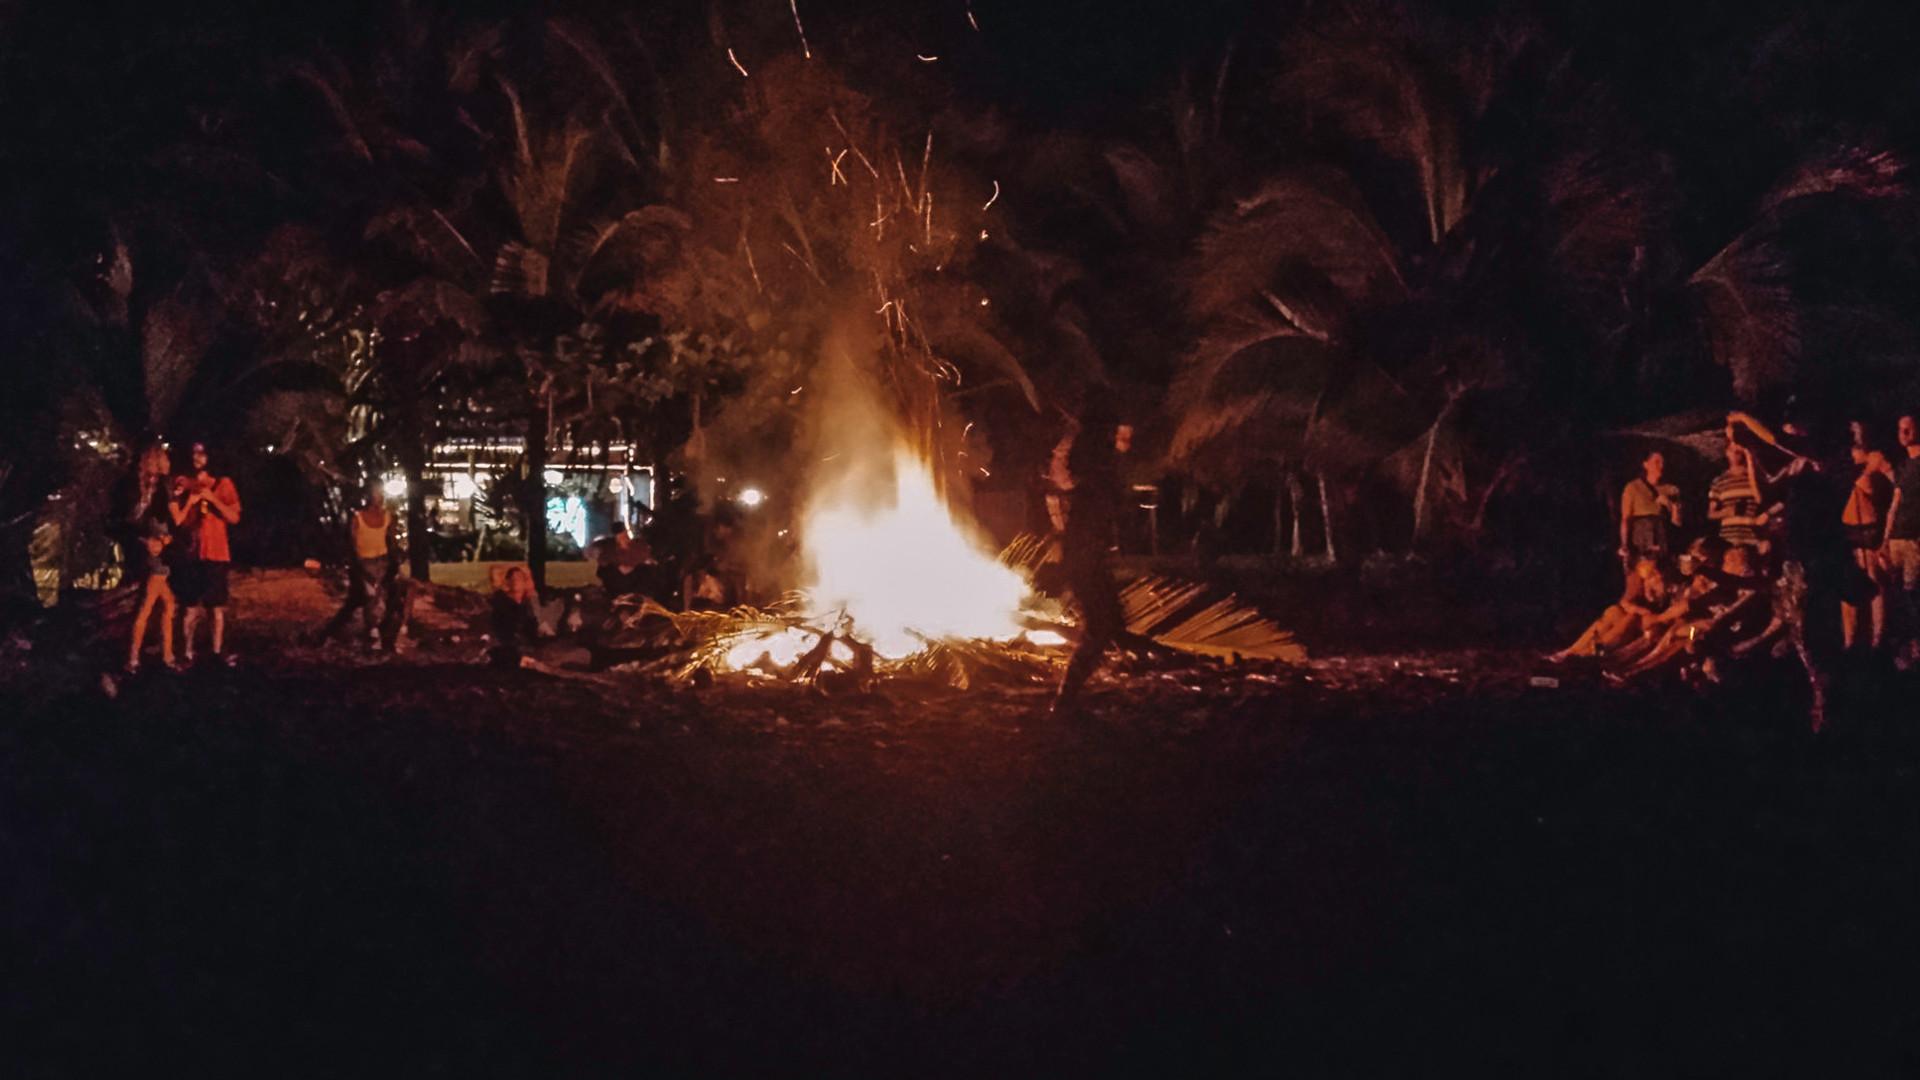 Costa-Rica-Bonfire.jpg